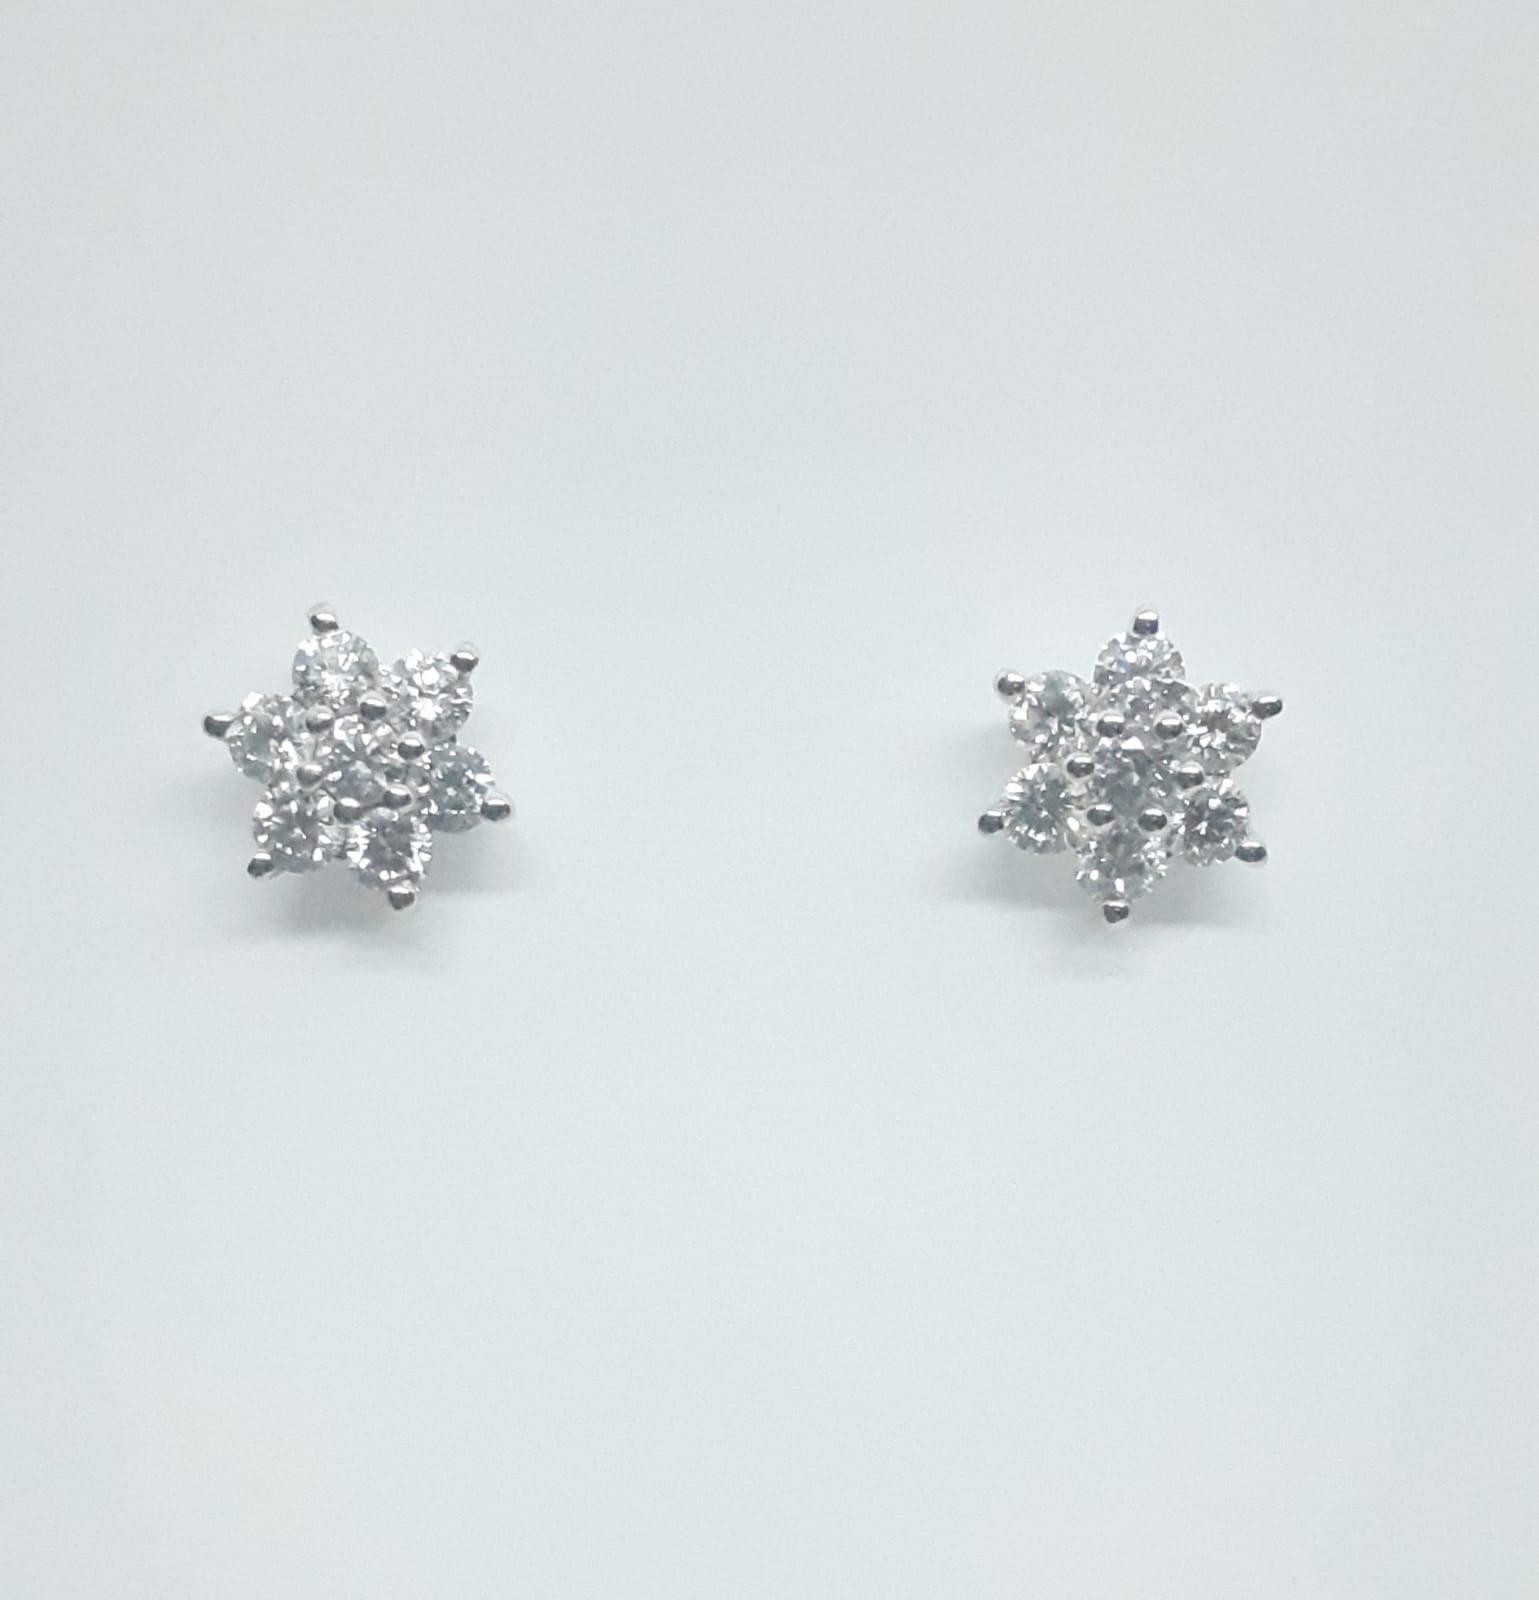 Sensi joyas jewellery Granada silver engagementDIAMONDS EARRINGS